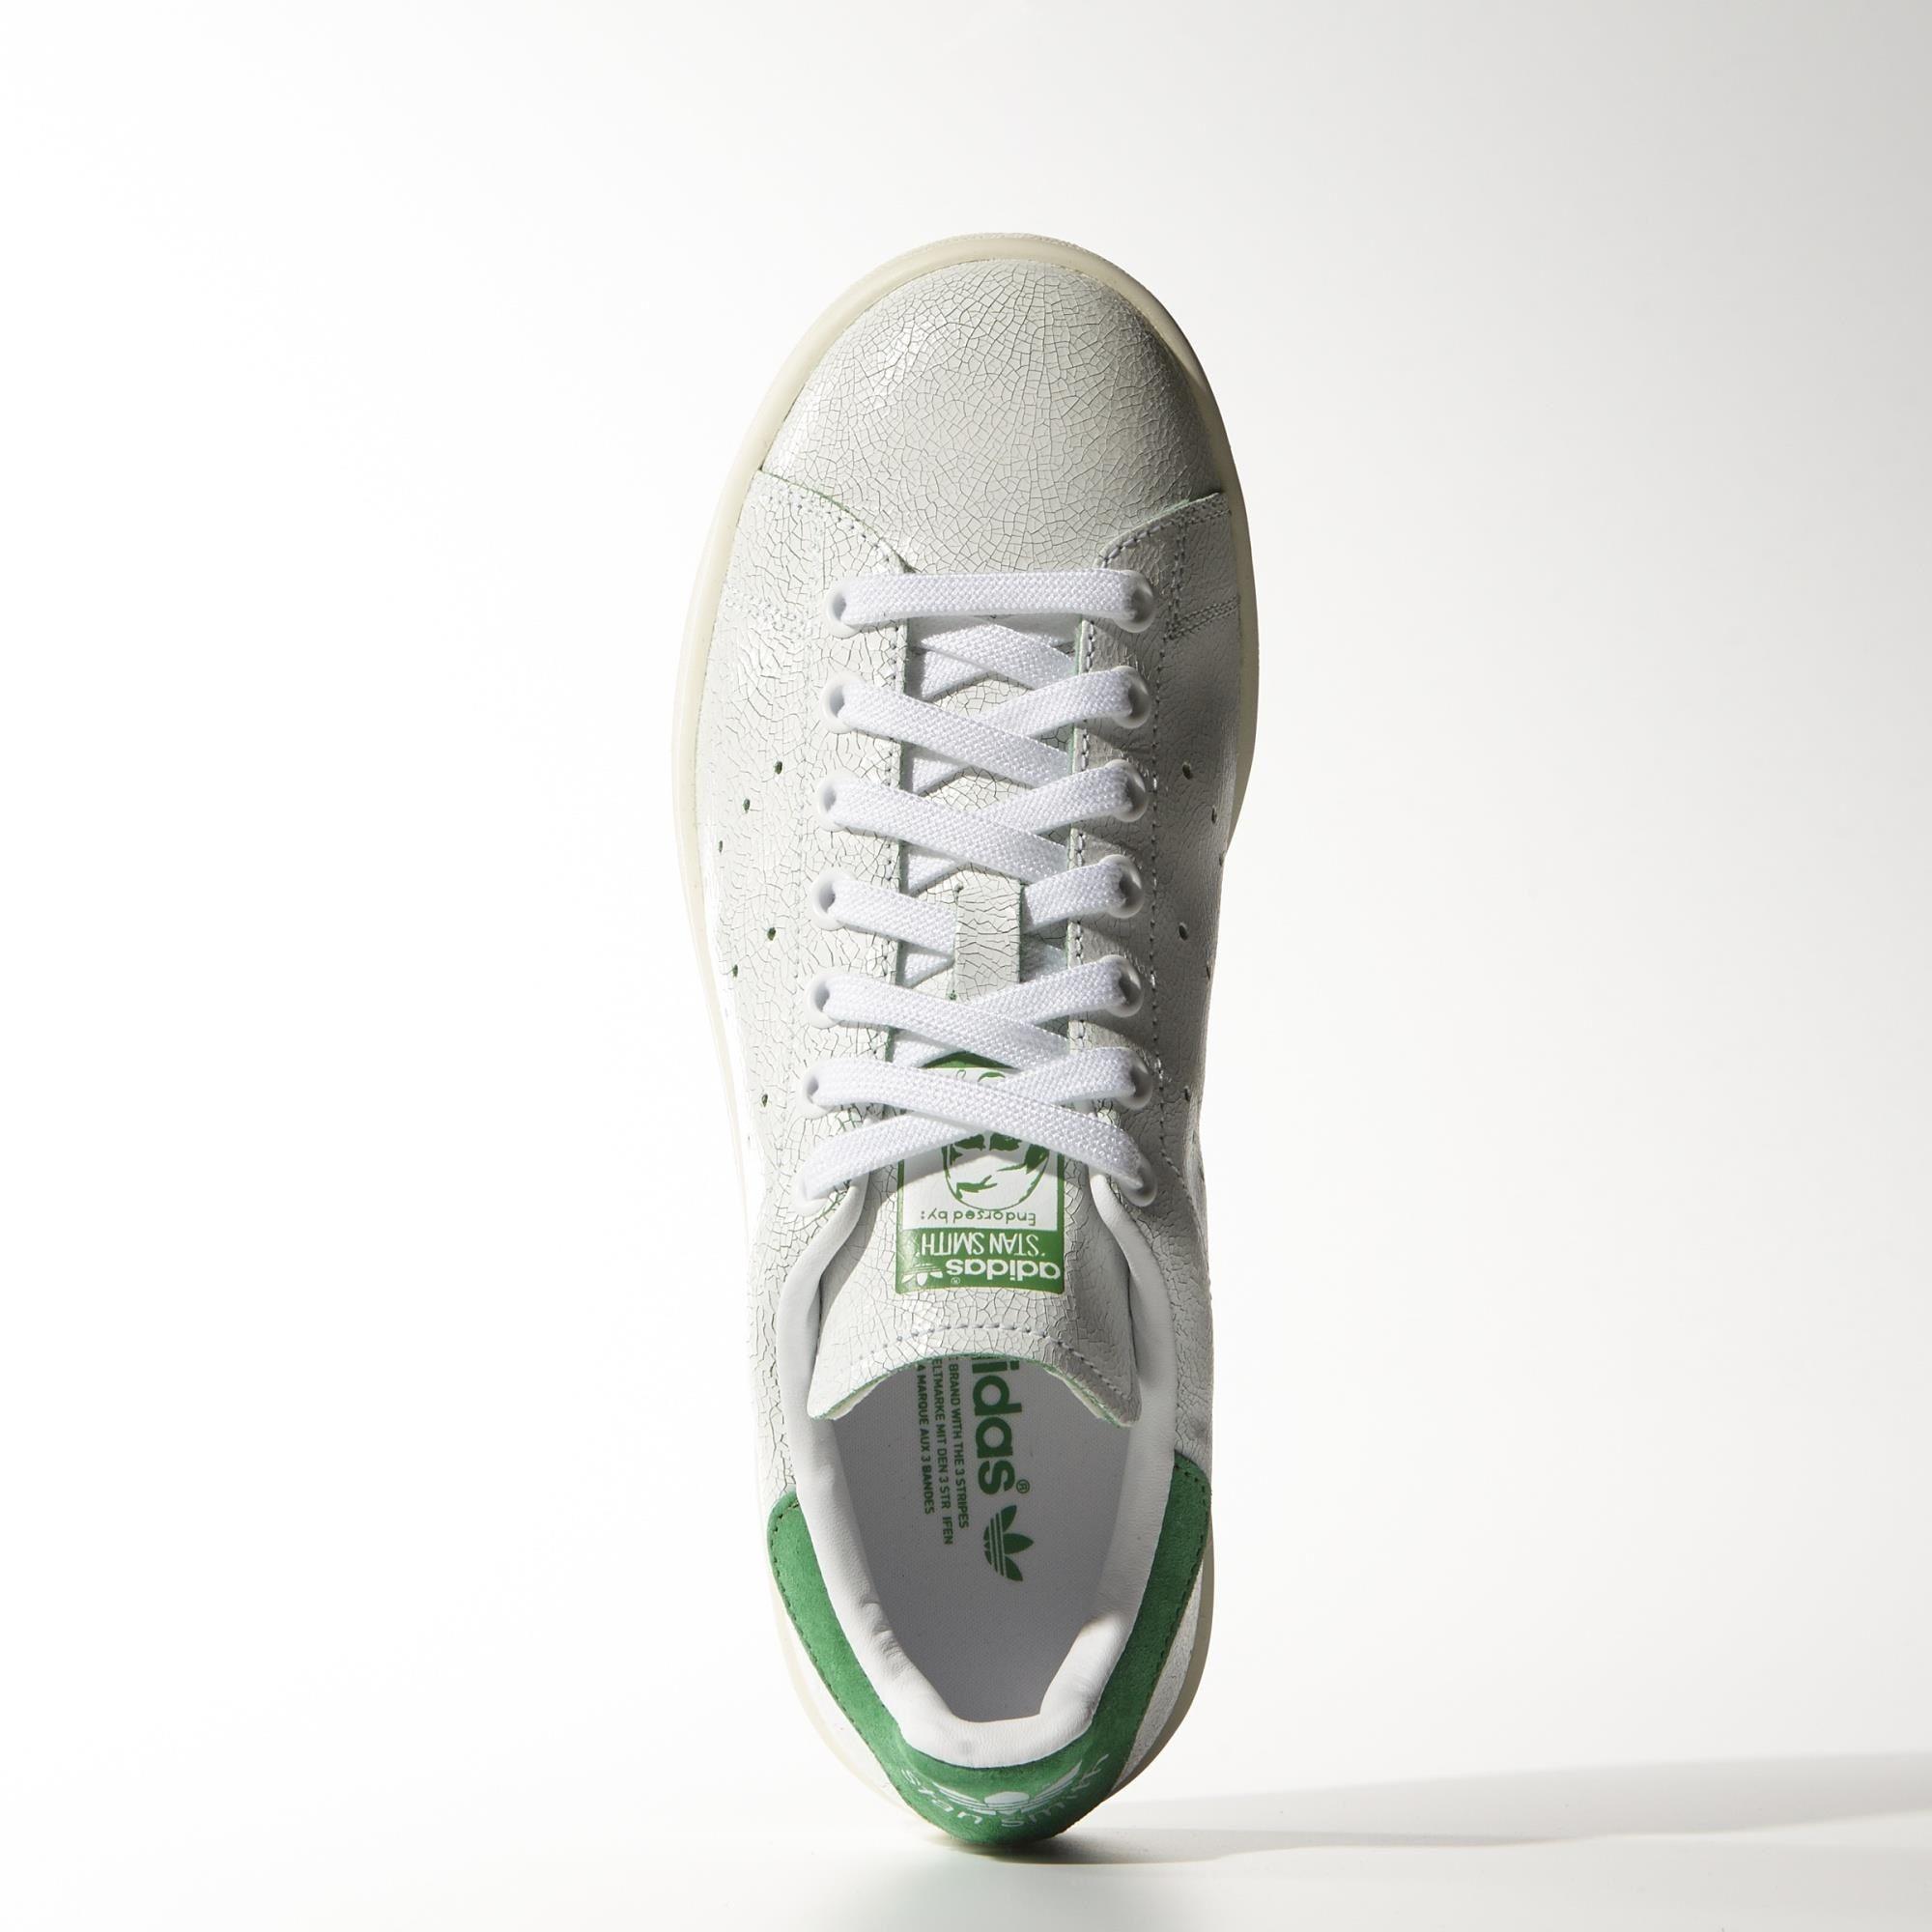 promo code 8cacc edc3b Scarpe Stan Smith - Bianco adidas   adidas Italia